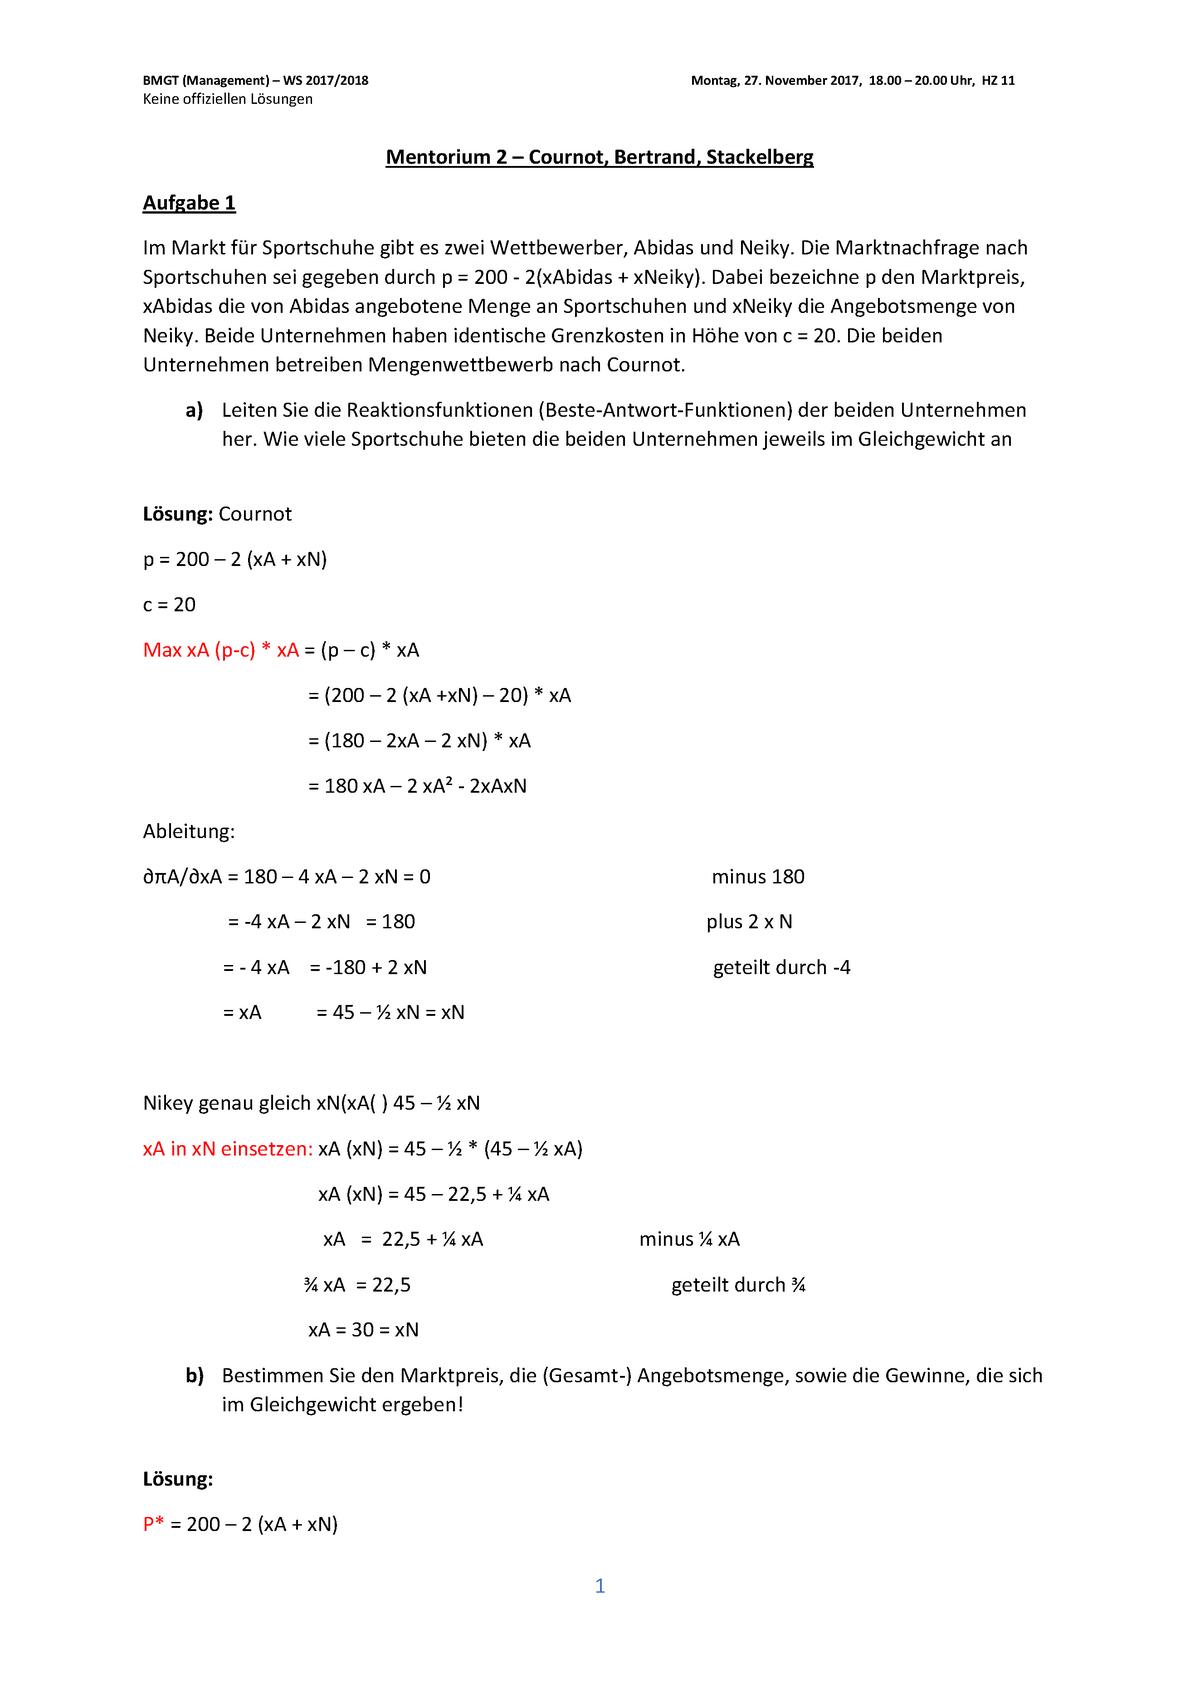 BMGT Mentorium 2 (WS 2017 18) BMGT: Management StuDocu